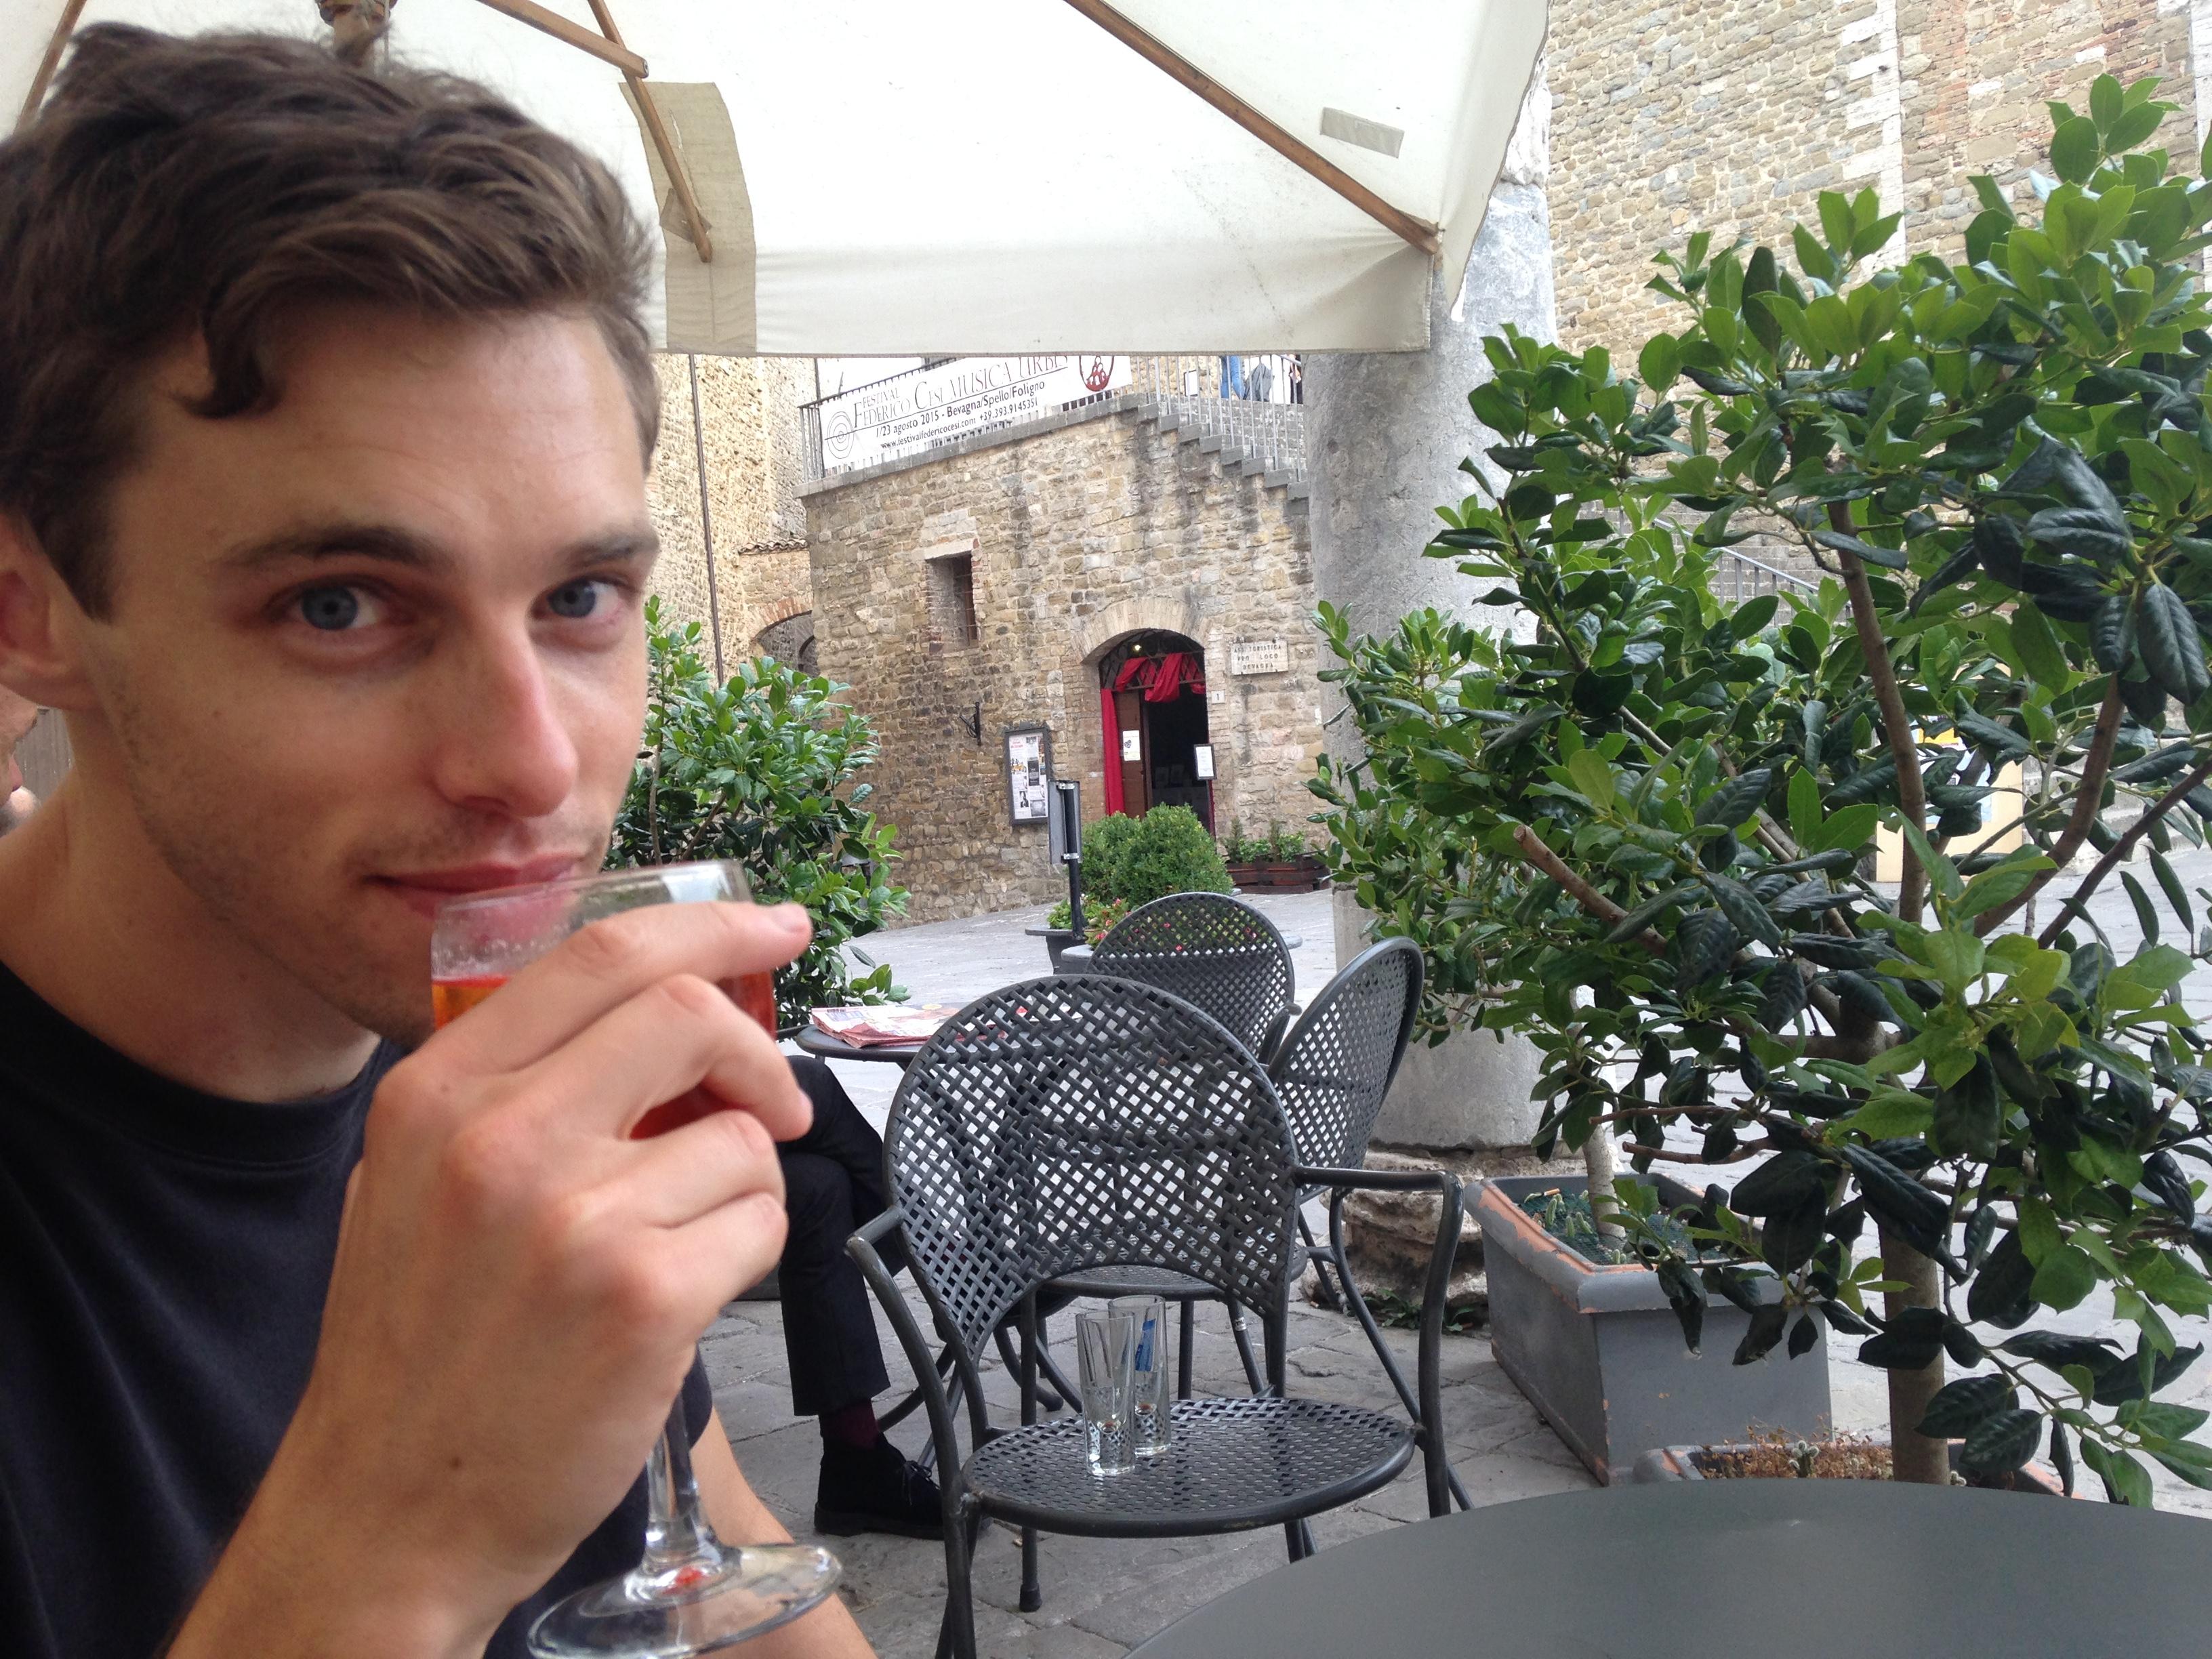 Joe Pinsker Italy